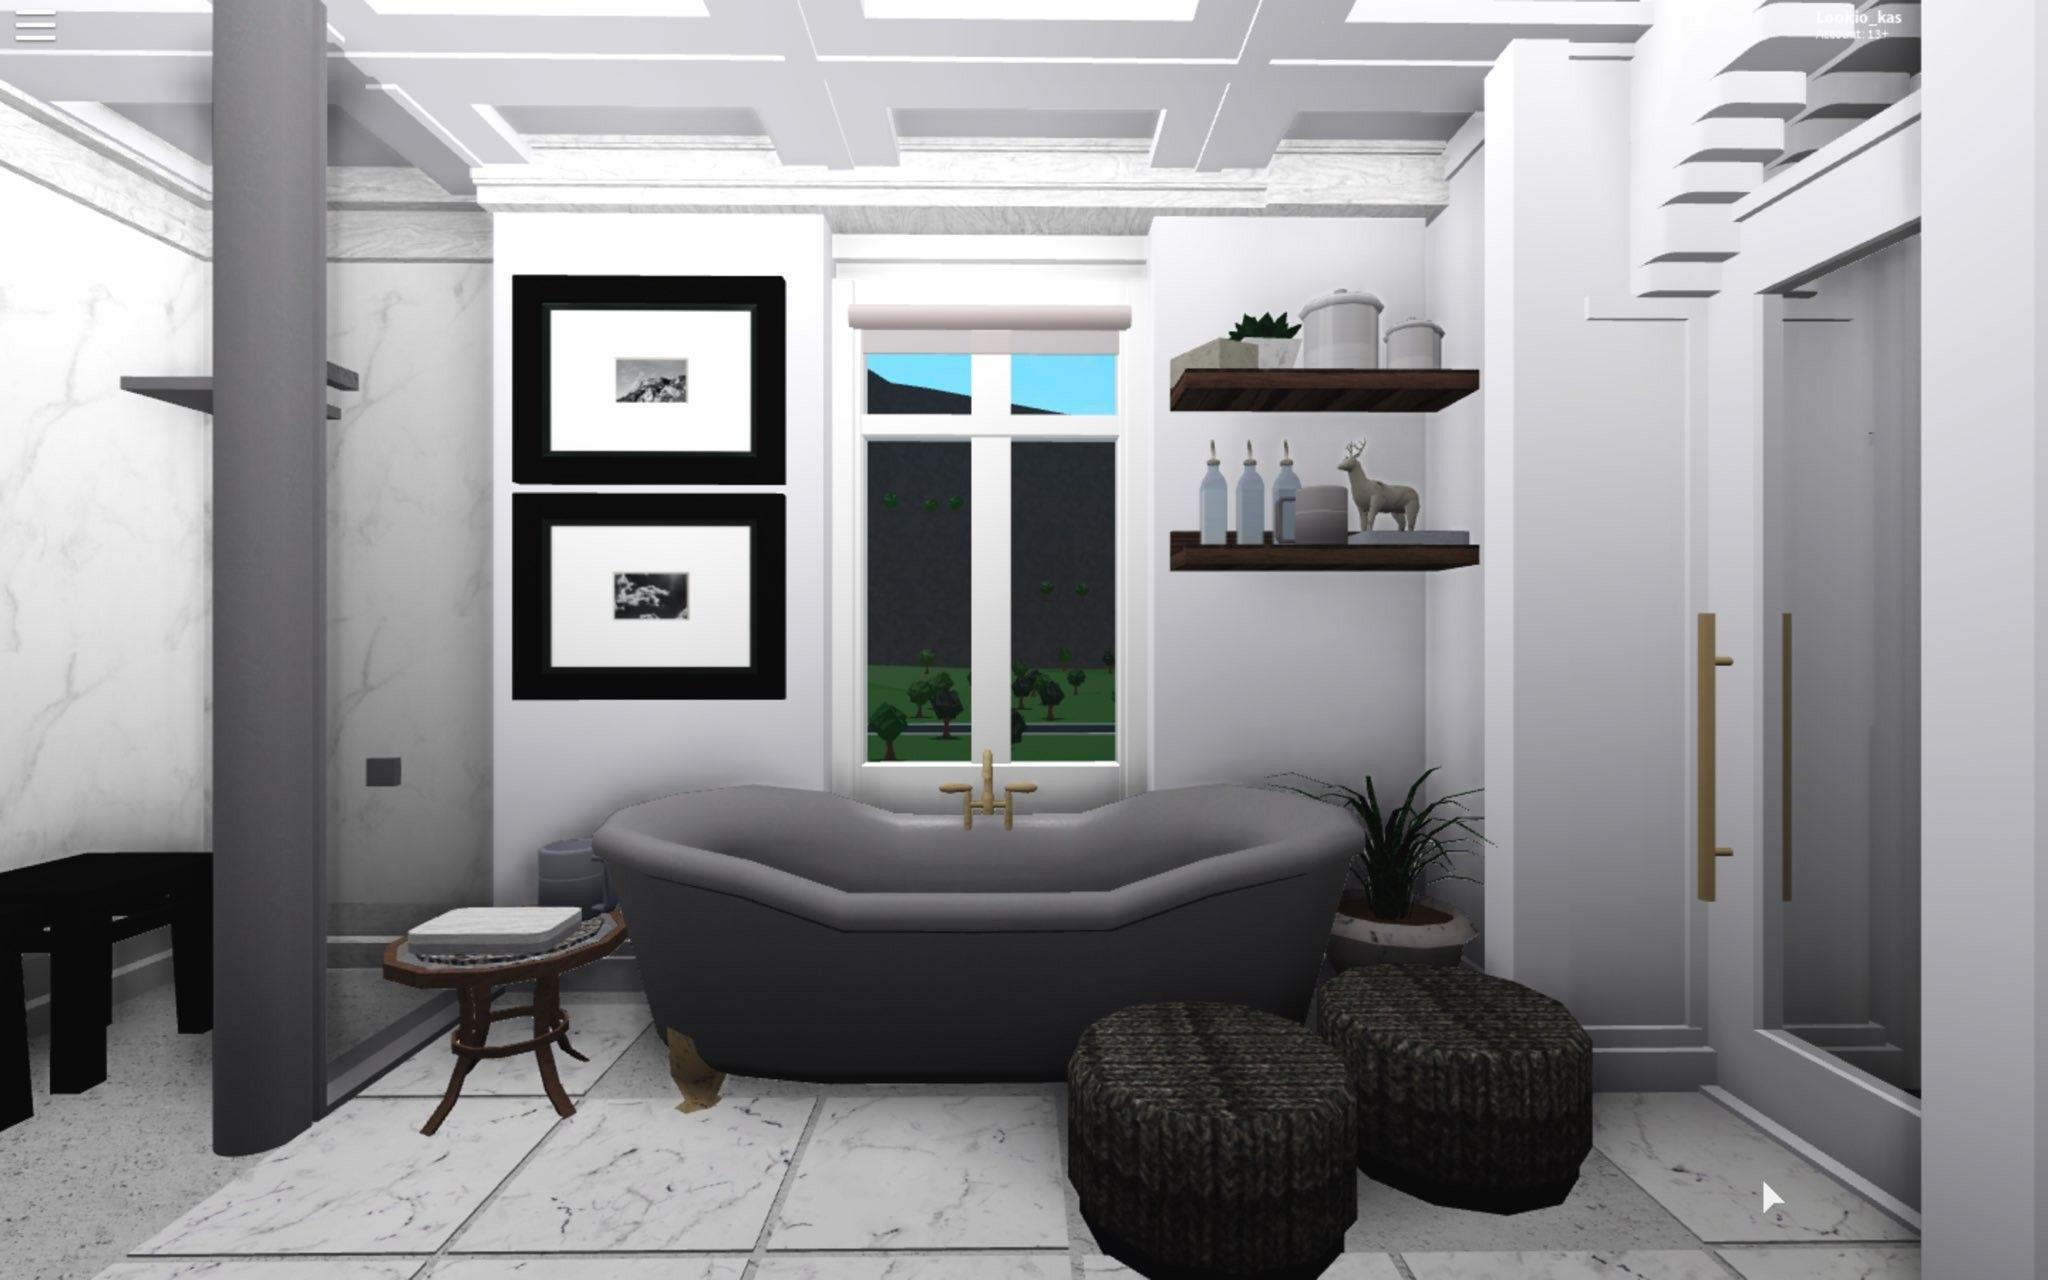 Dark Bathroom House Rooms Tiny House Bedroom Small House Design Plans Living room bloxburg bathroom